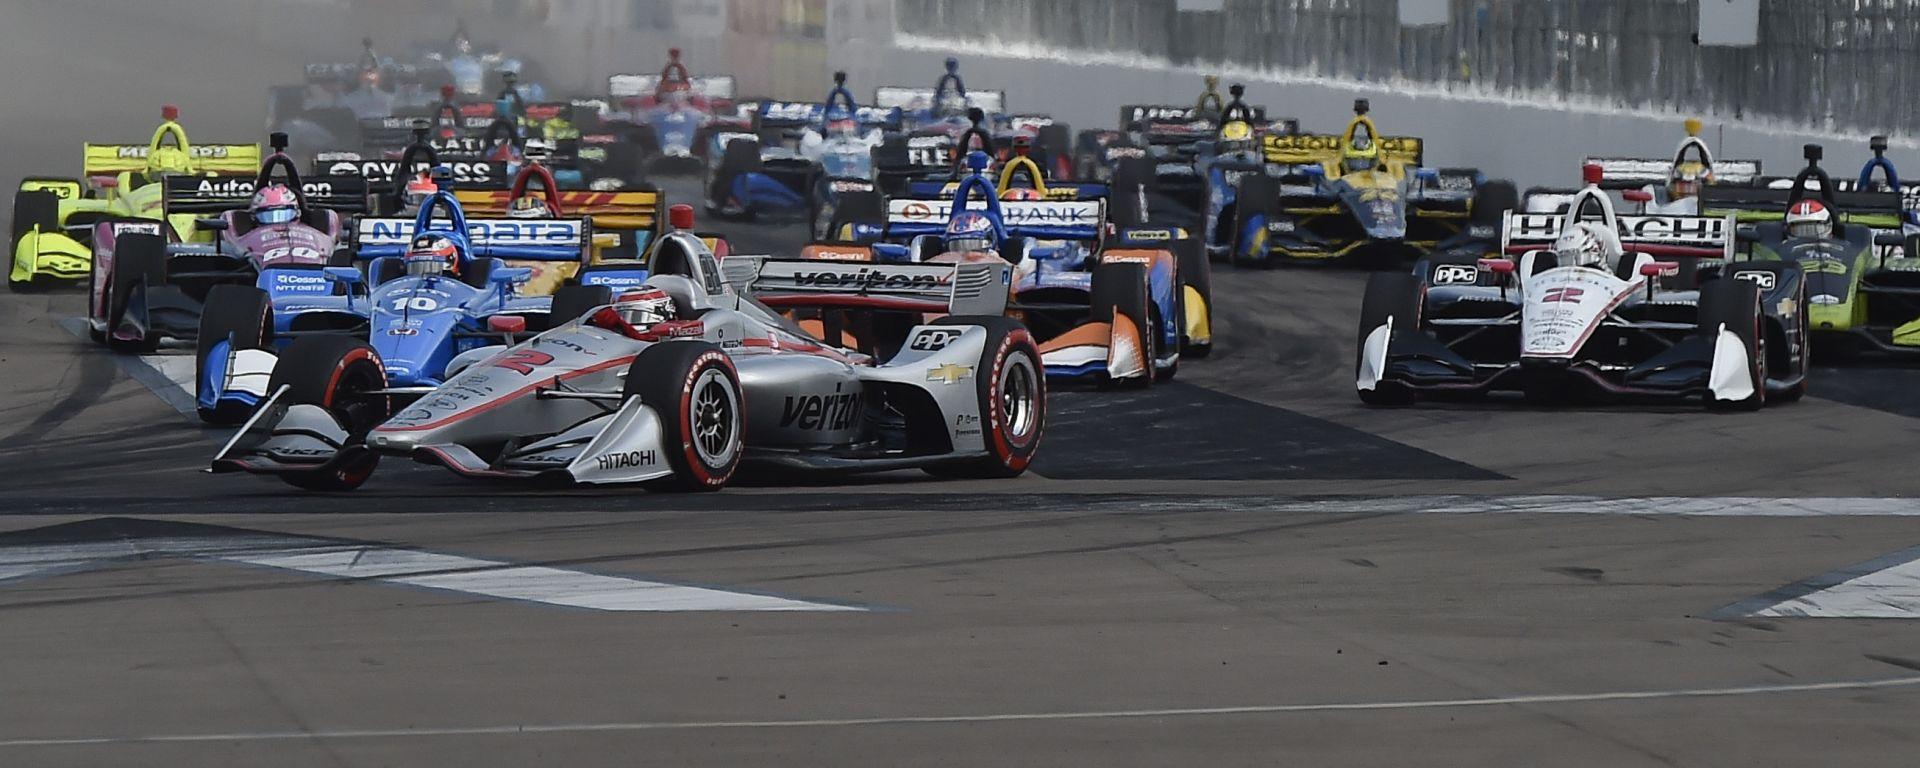 Indycar a St Petersburg